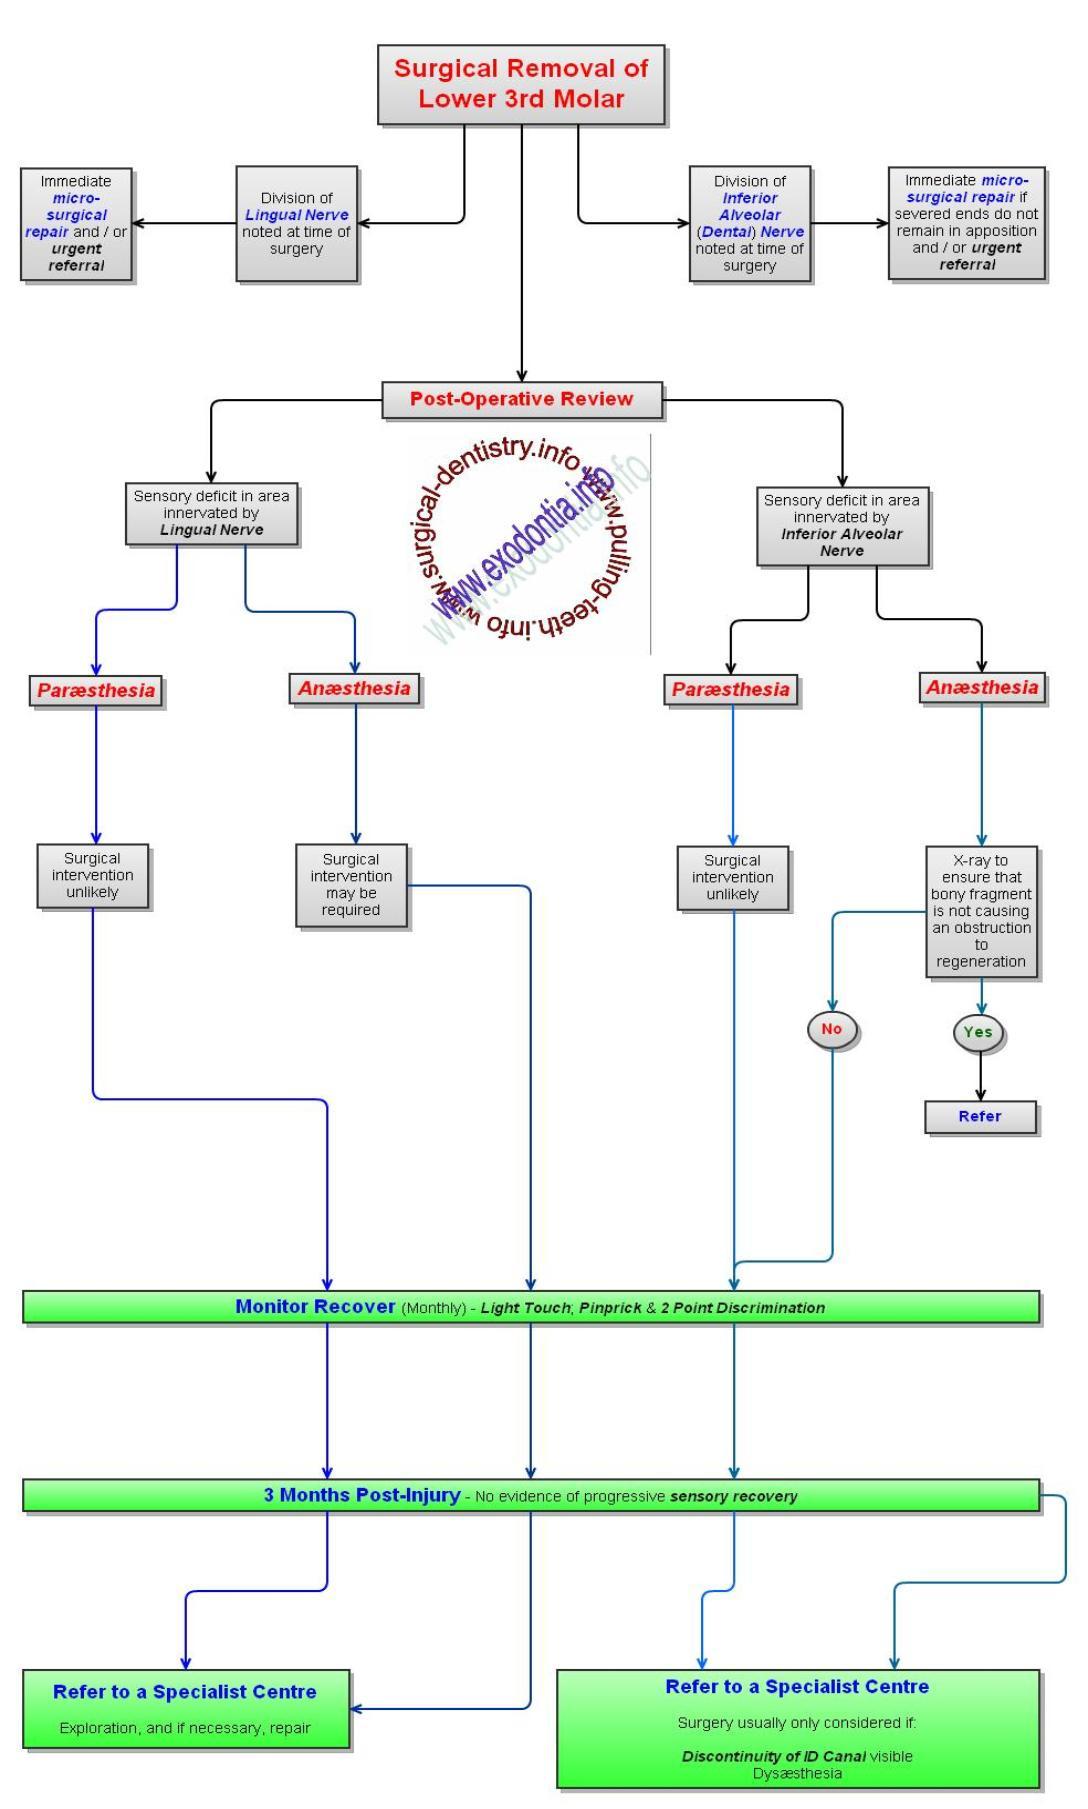 Dental_Nerve_Injury_Treatment_Protocol-1088x1809